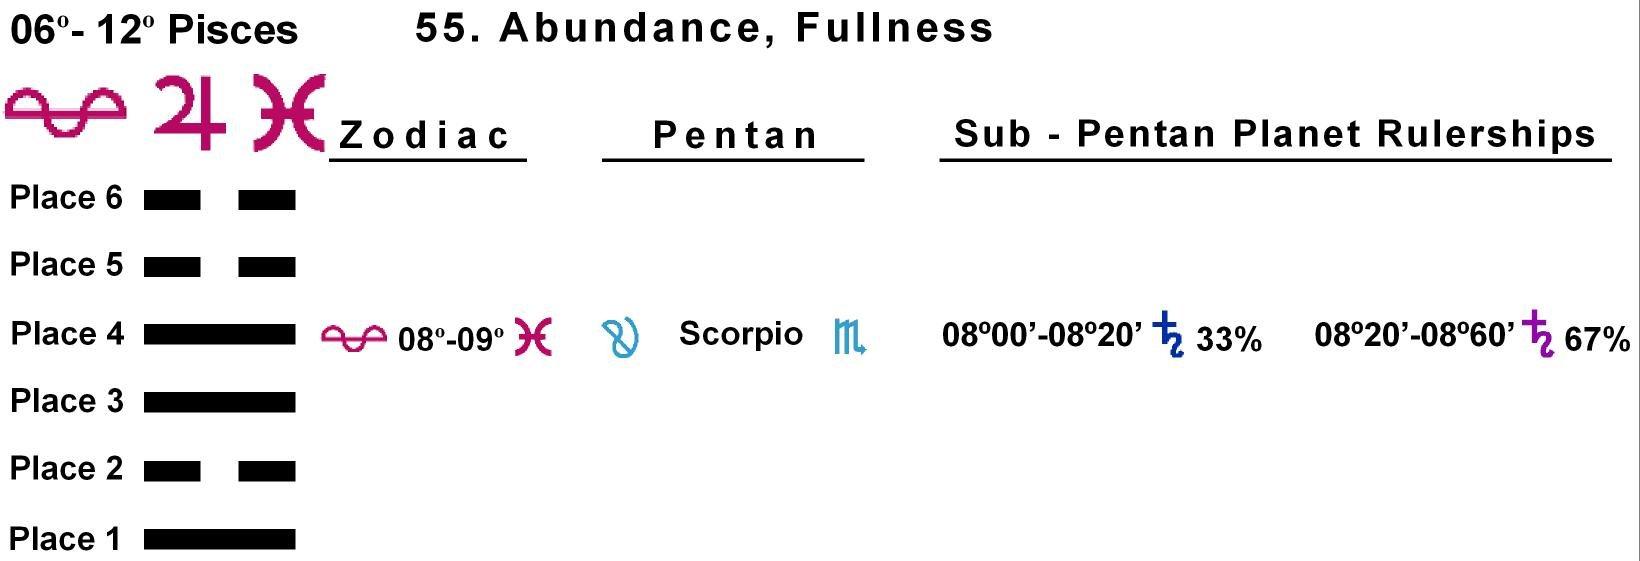 Pent-lines-12PI 08-09 Hx-55 Abundance